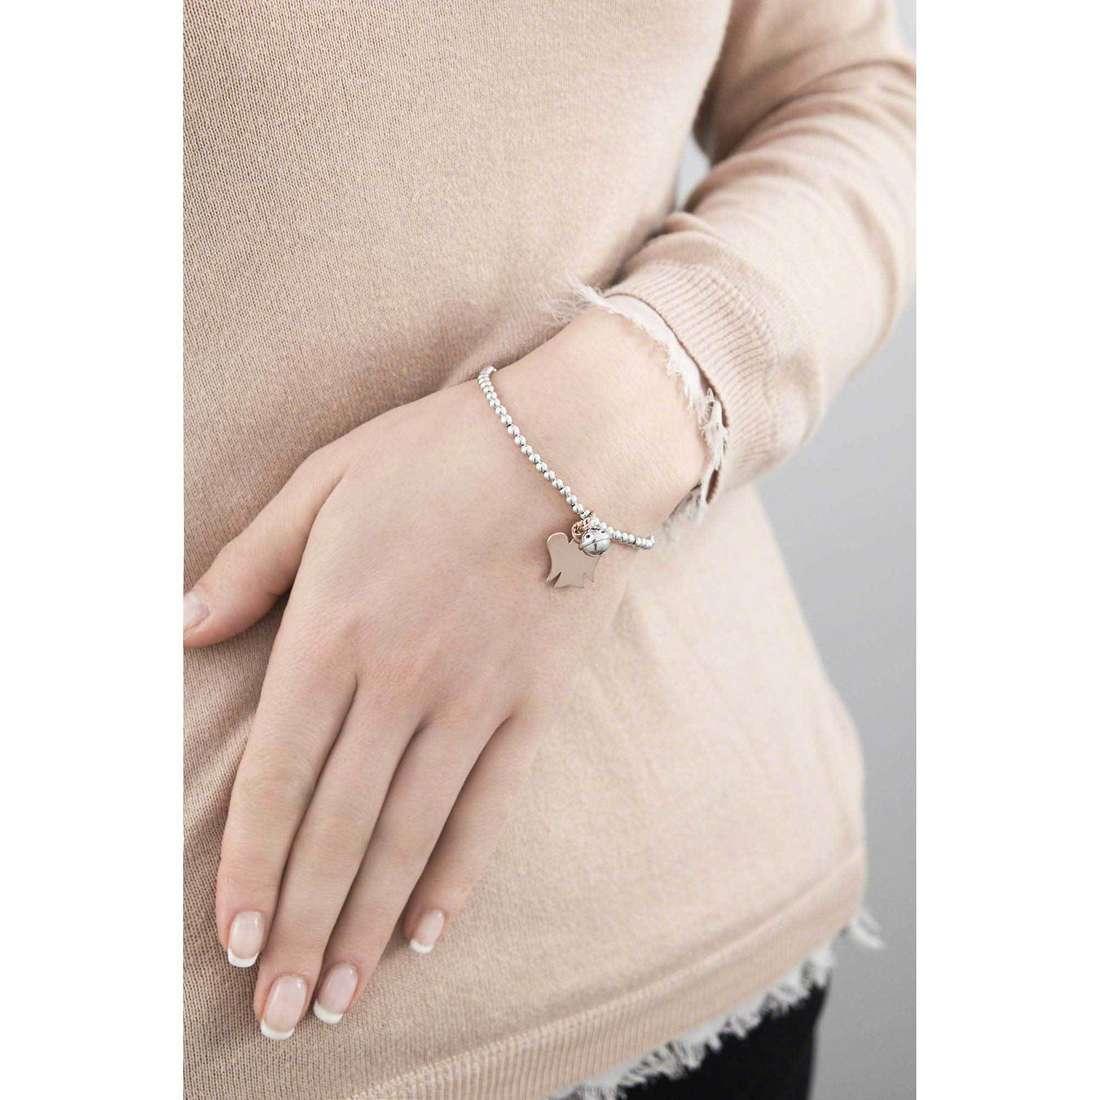 Giannotti bracelets Chiama Angeli femme GIA242 indosso